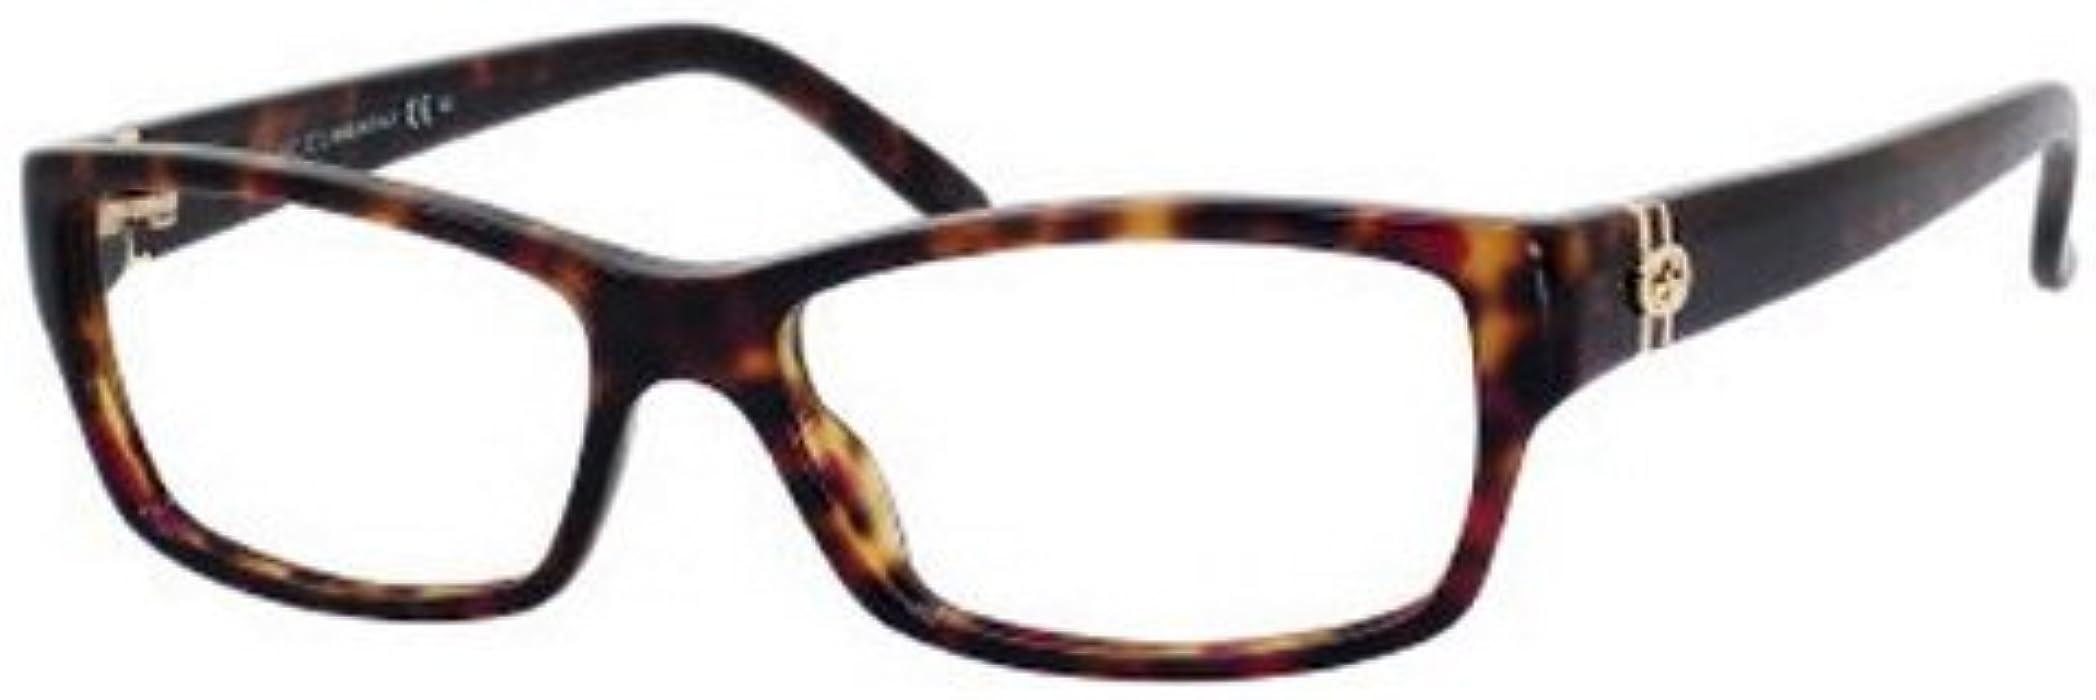 4dfe9c9e89b Amazon.com  Gucci GG3573 Eyeglasses-0TVD Havana-54mm  Clothing